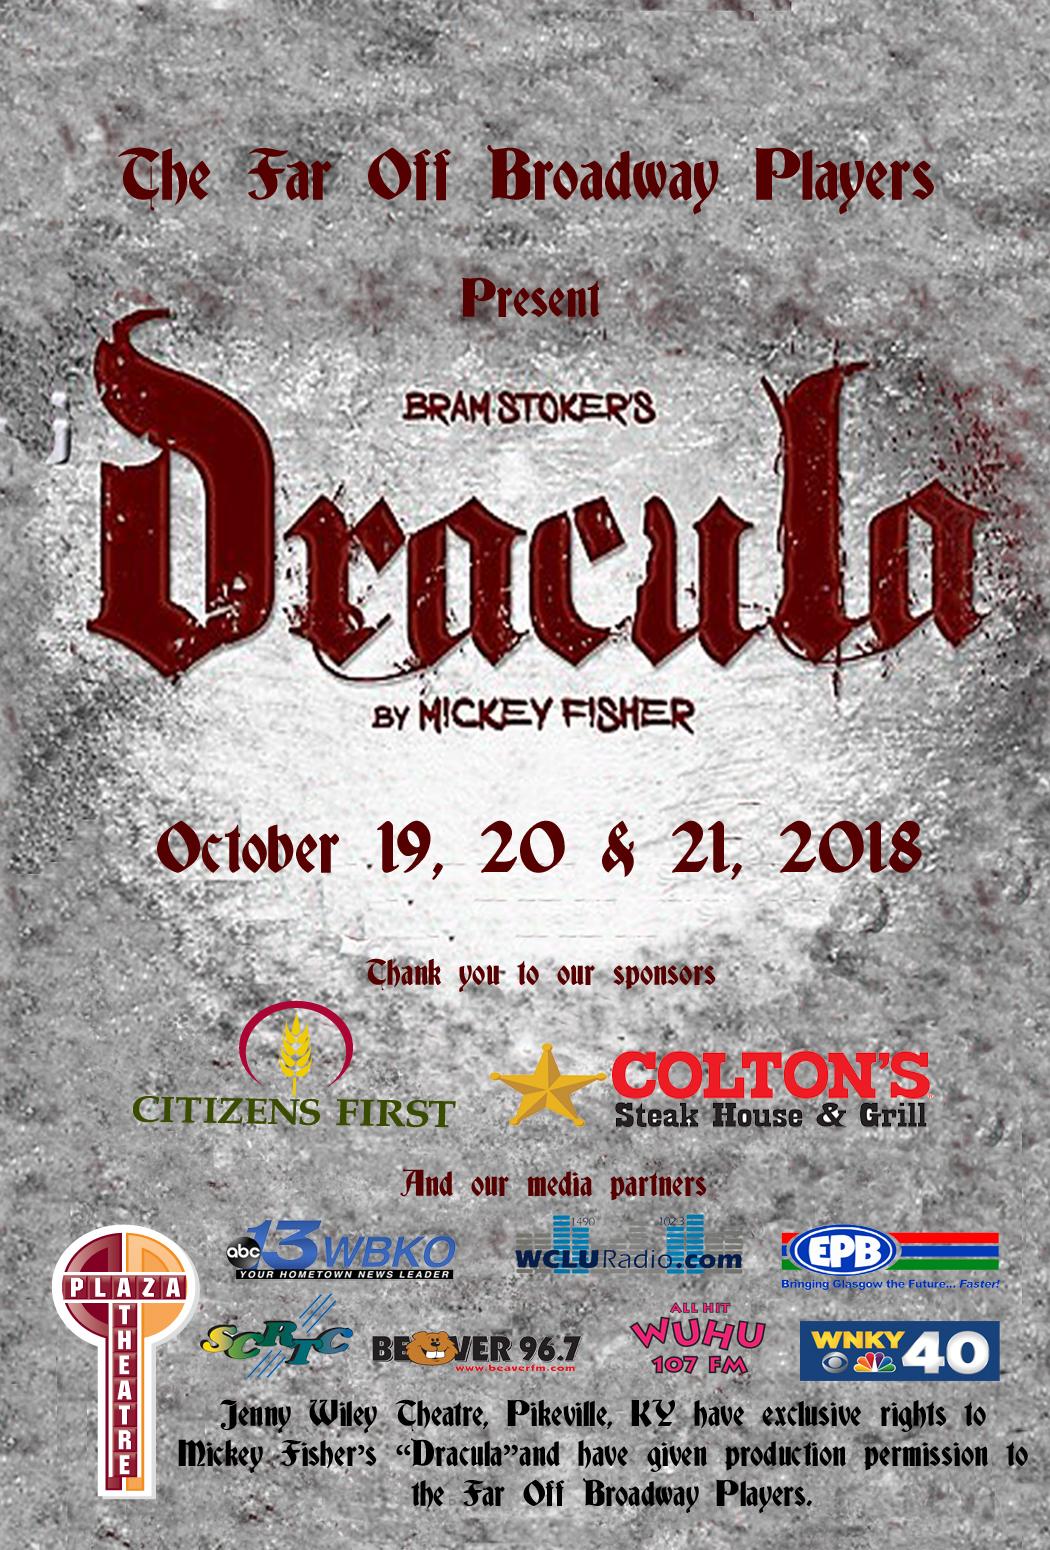 Page 1 Dracula Program Cover.jpg